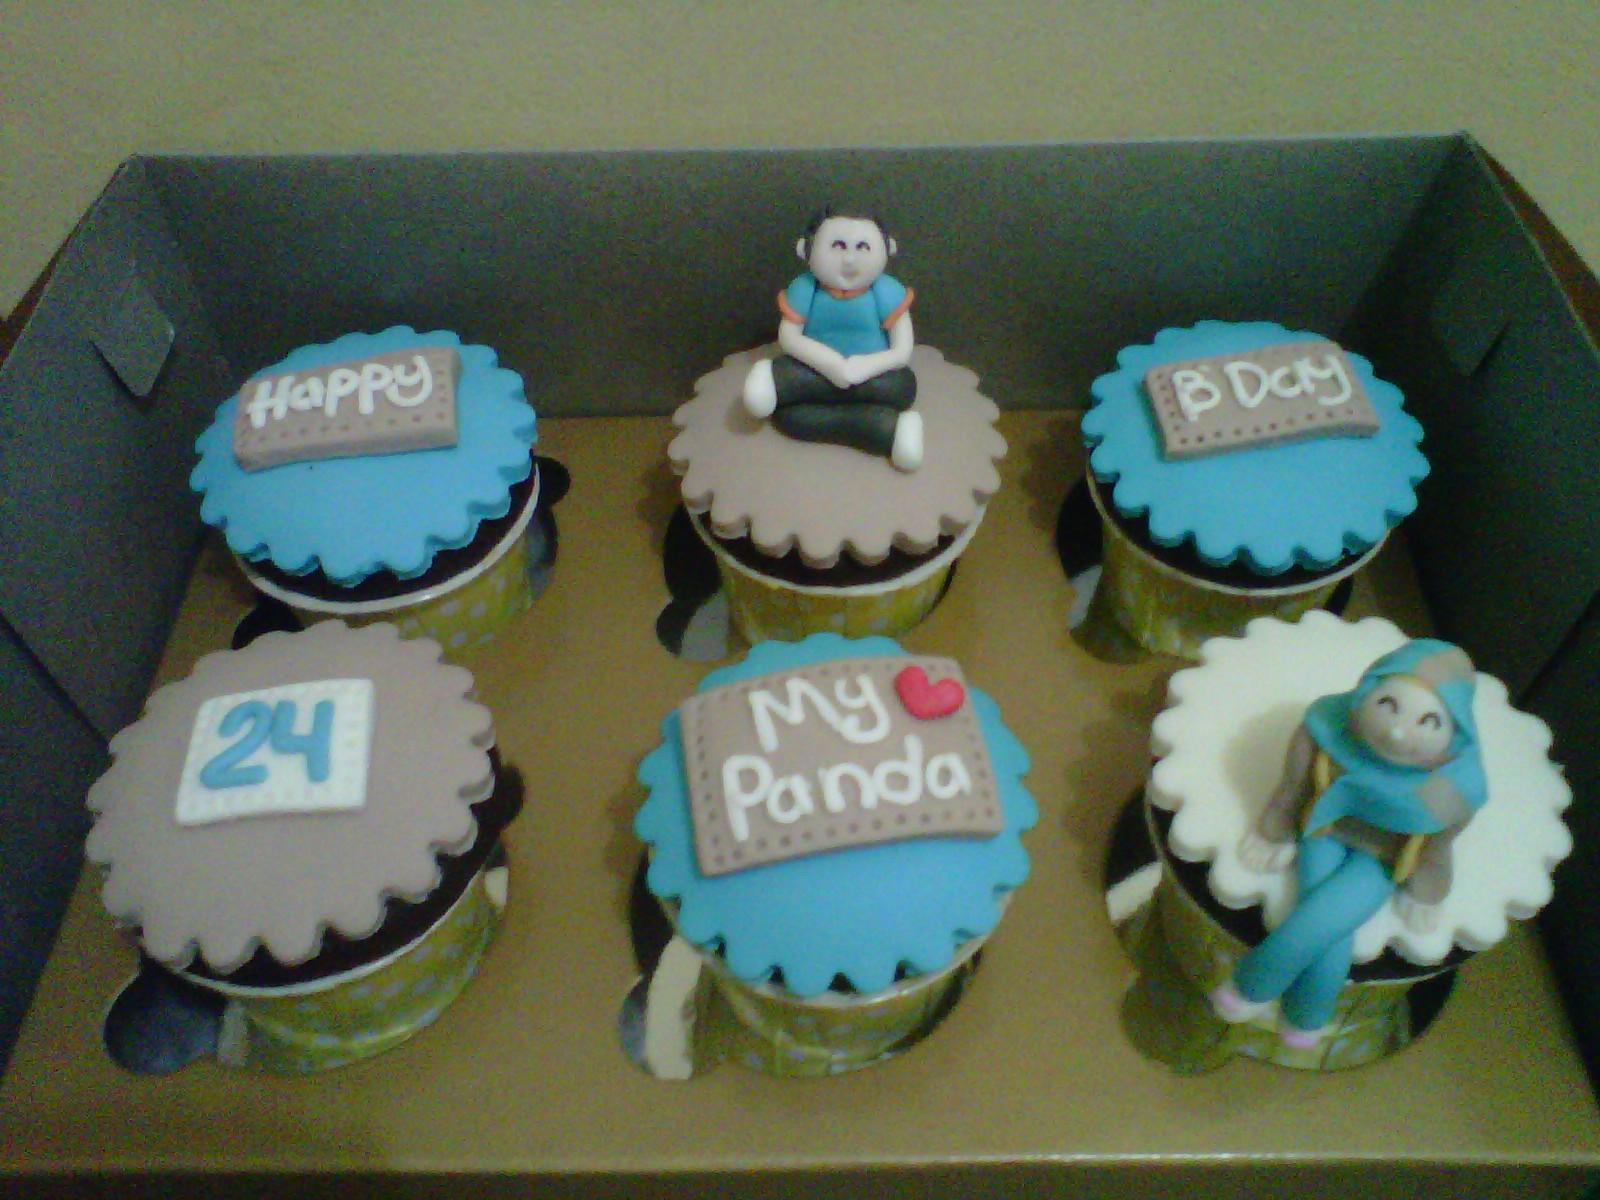 boyfriend cupcakes - photo #5